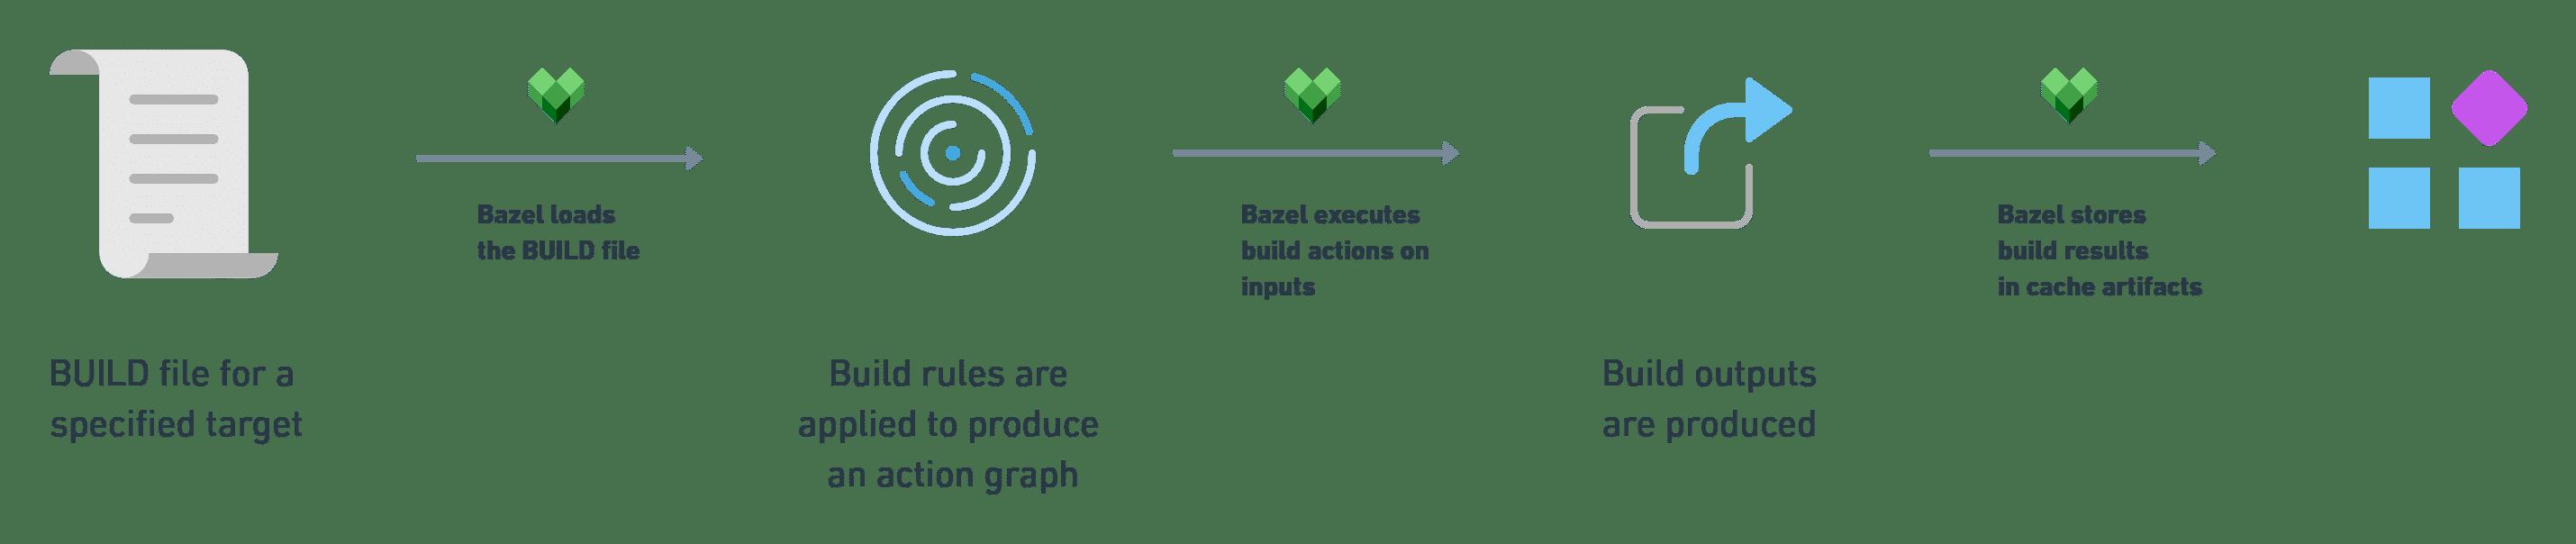 Bazel Build Process